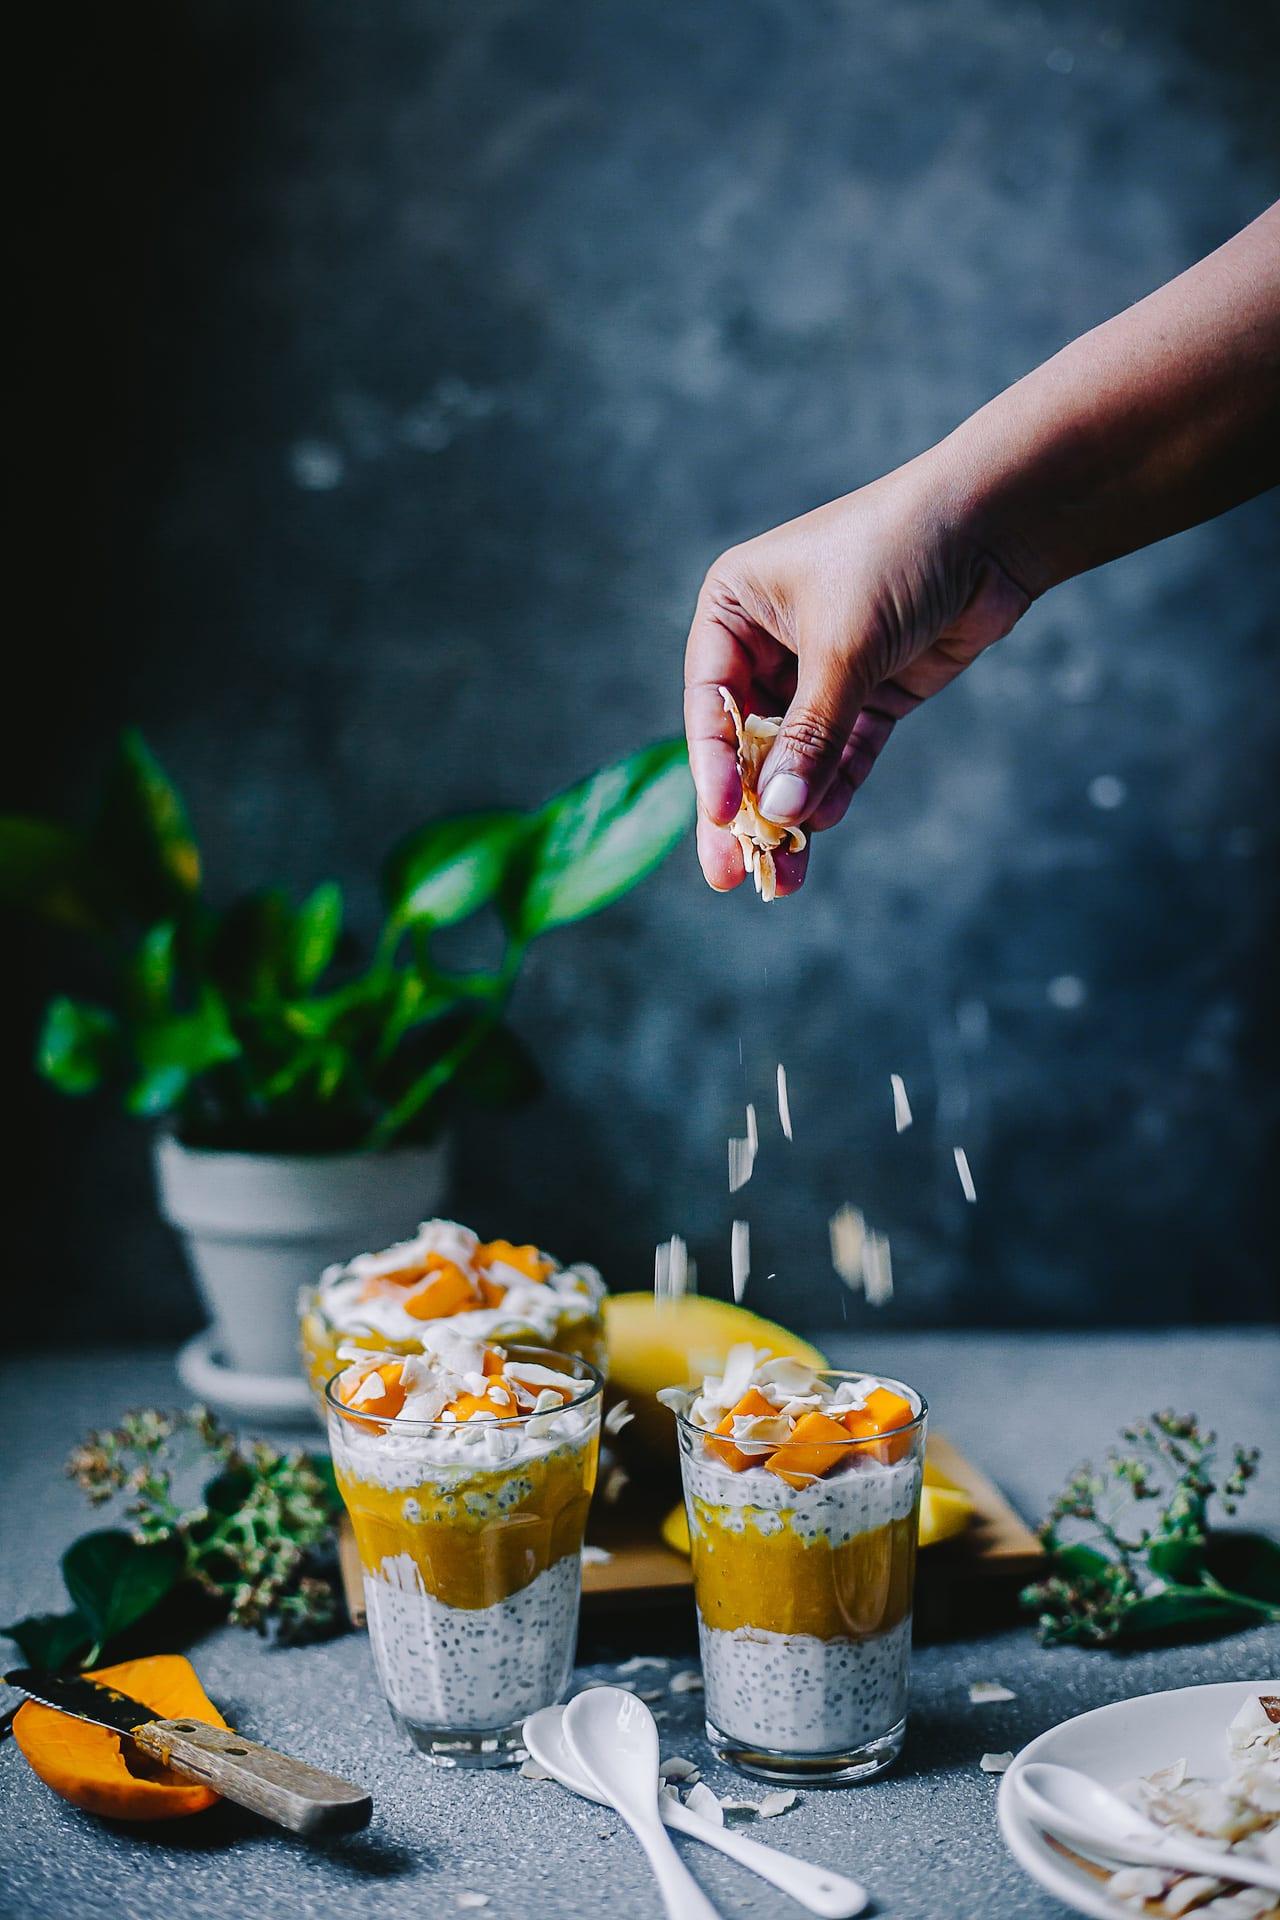 Chia Coconut Mango Pudding | Playful Cooking #chia #mango #breakfast #pudding #coconut